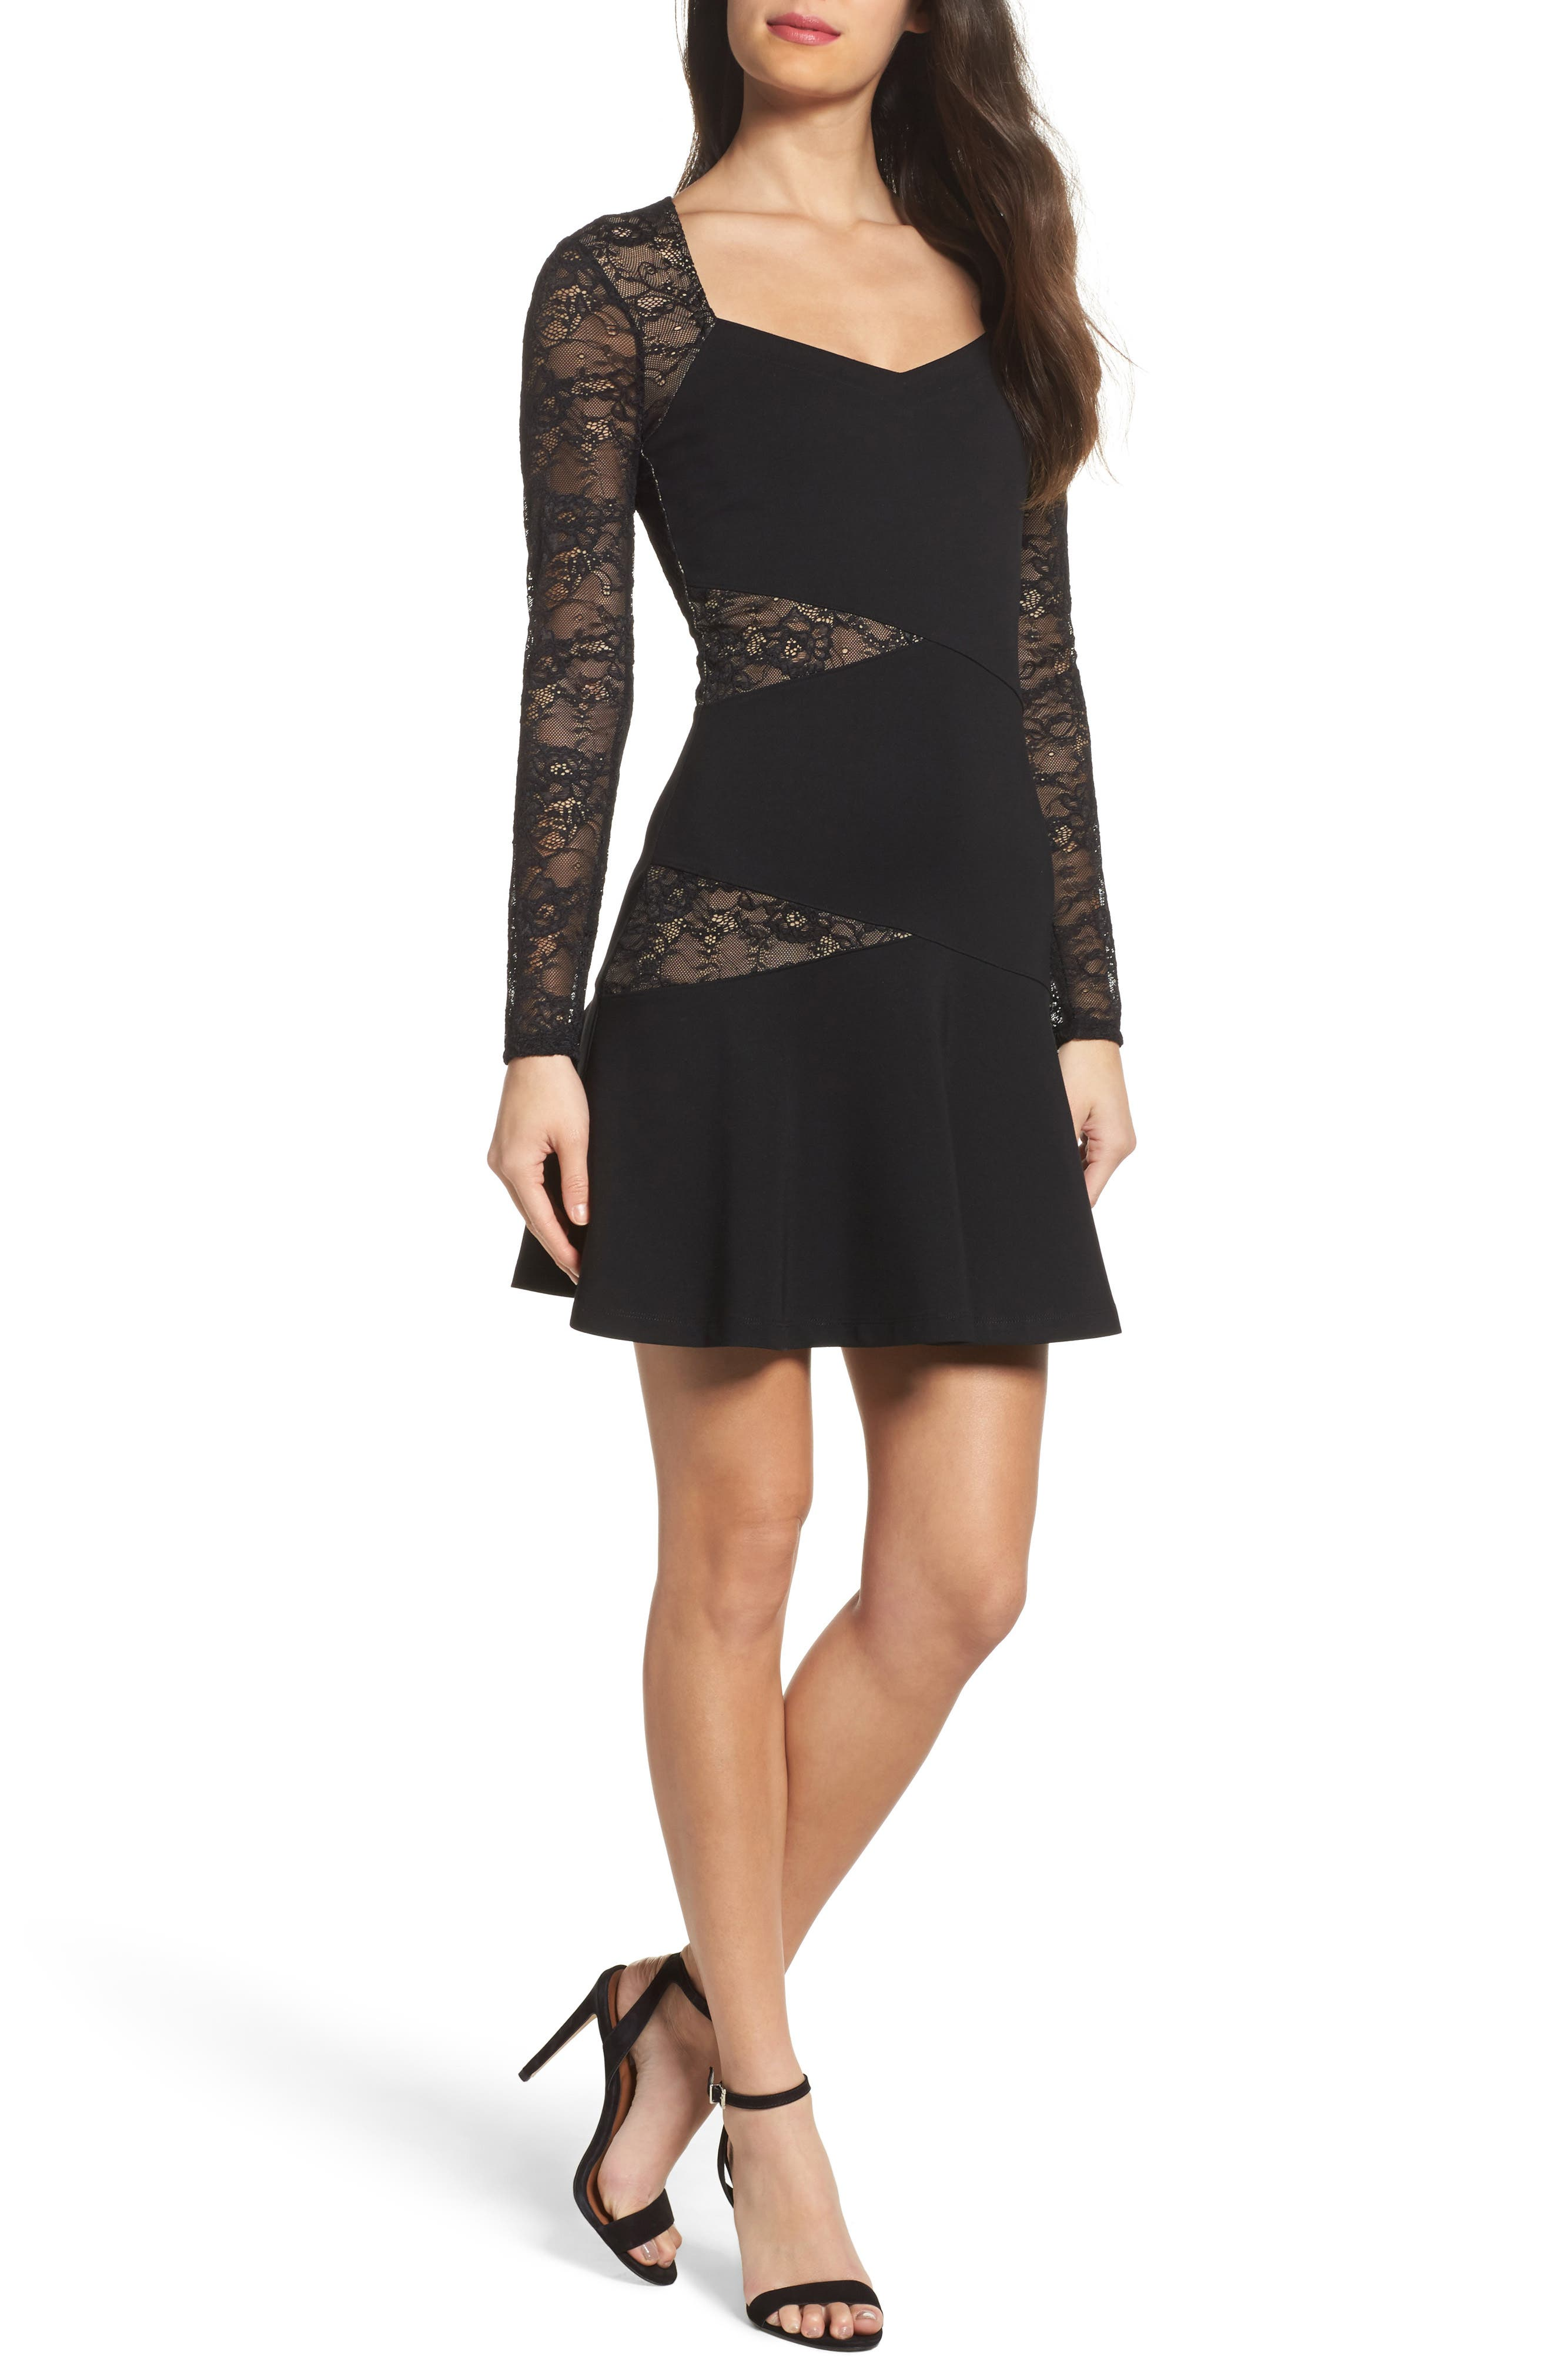 Main Image - Ali & Jay L'Arc Ponte Knit Fit & Flare Dress